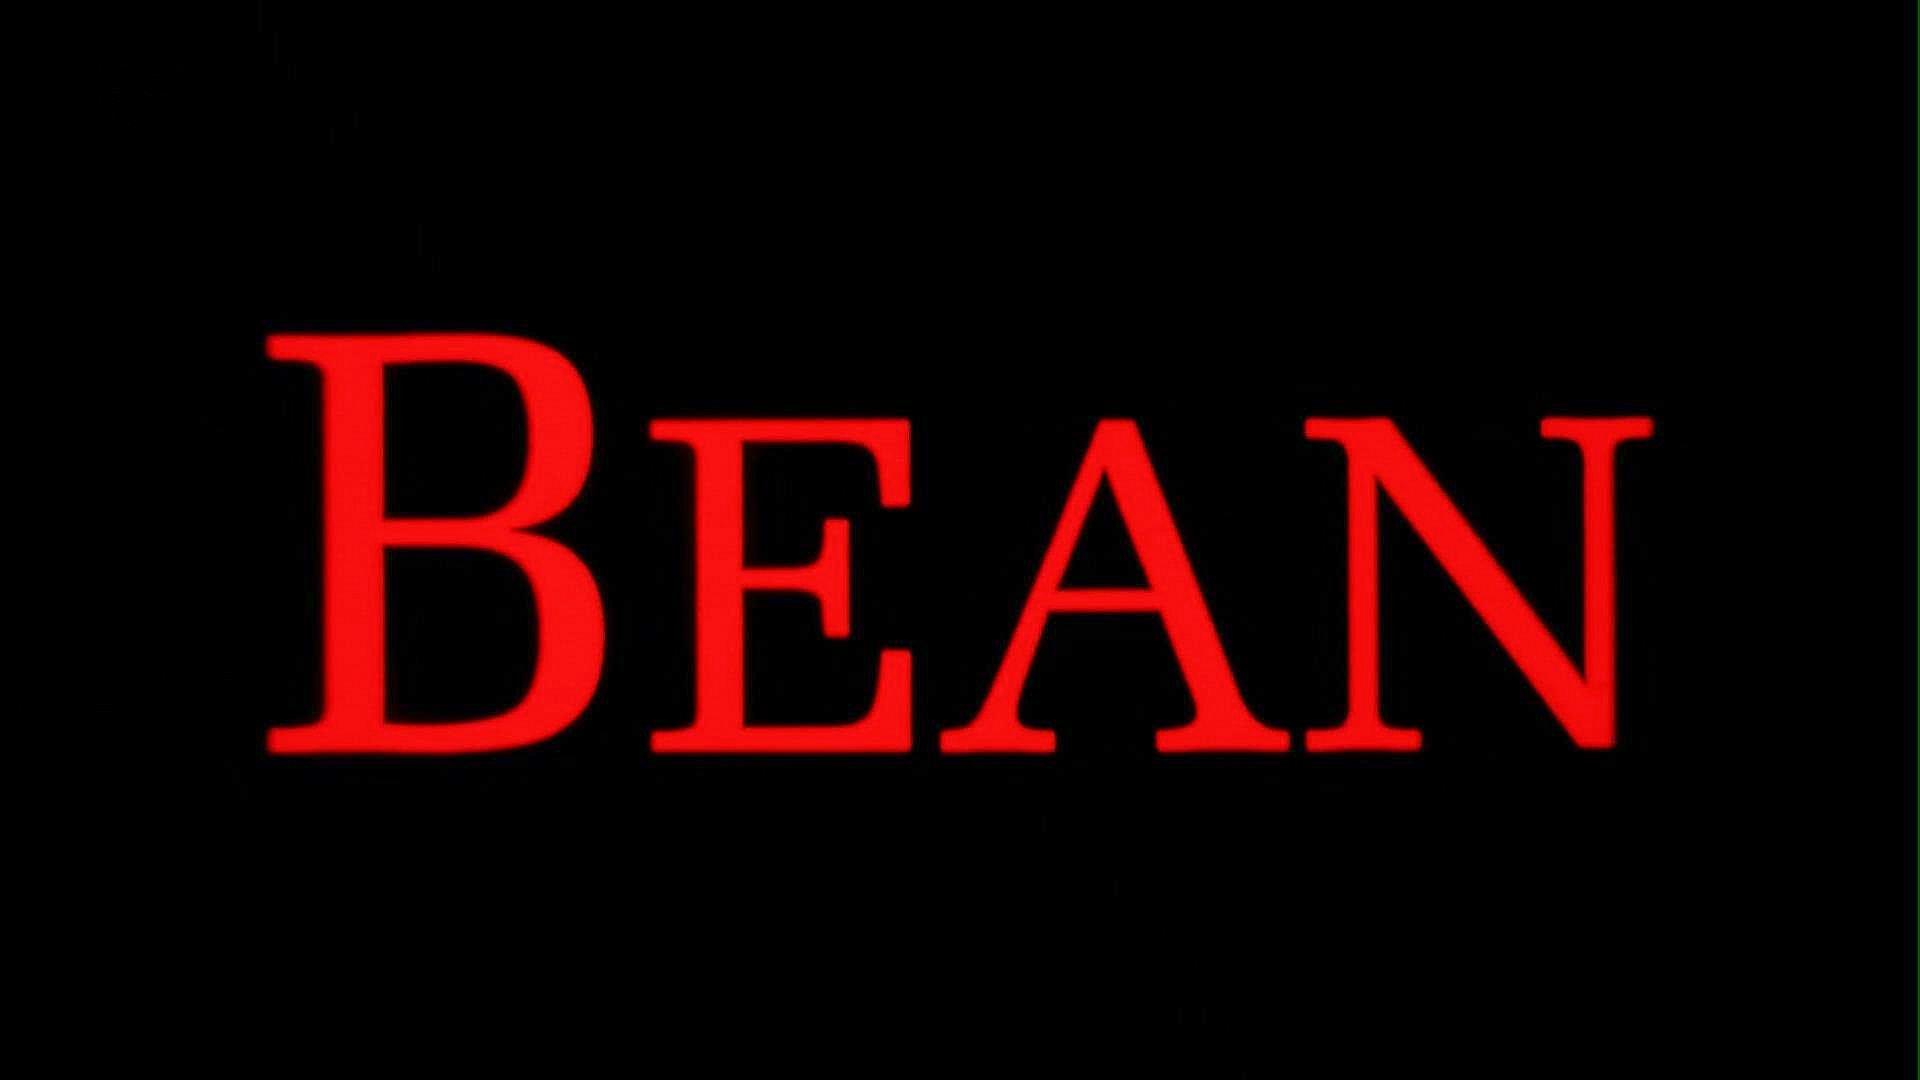 Bean 1997 Film